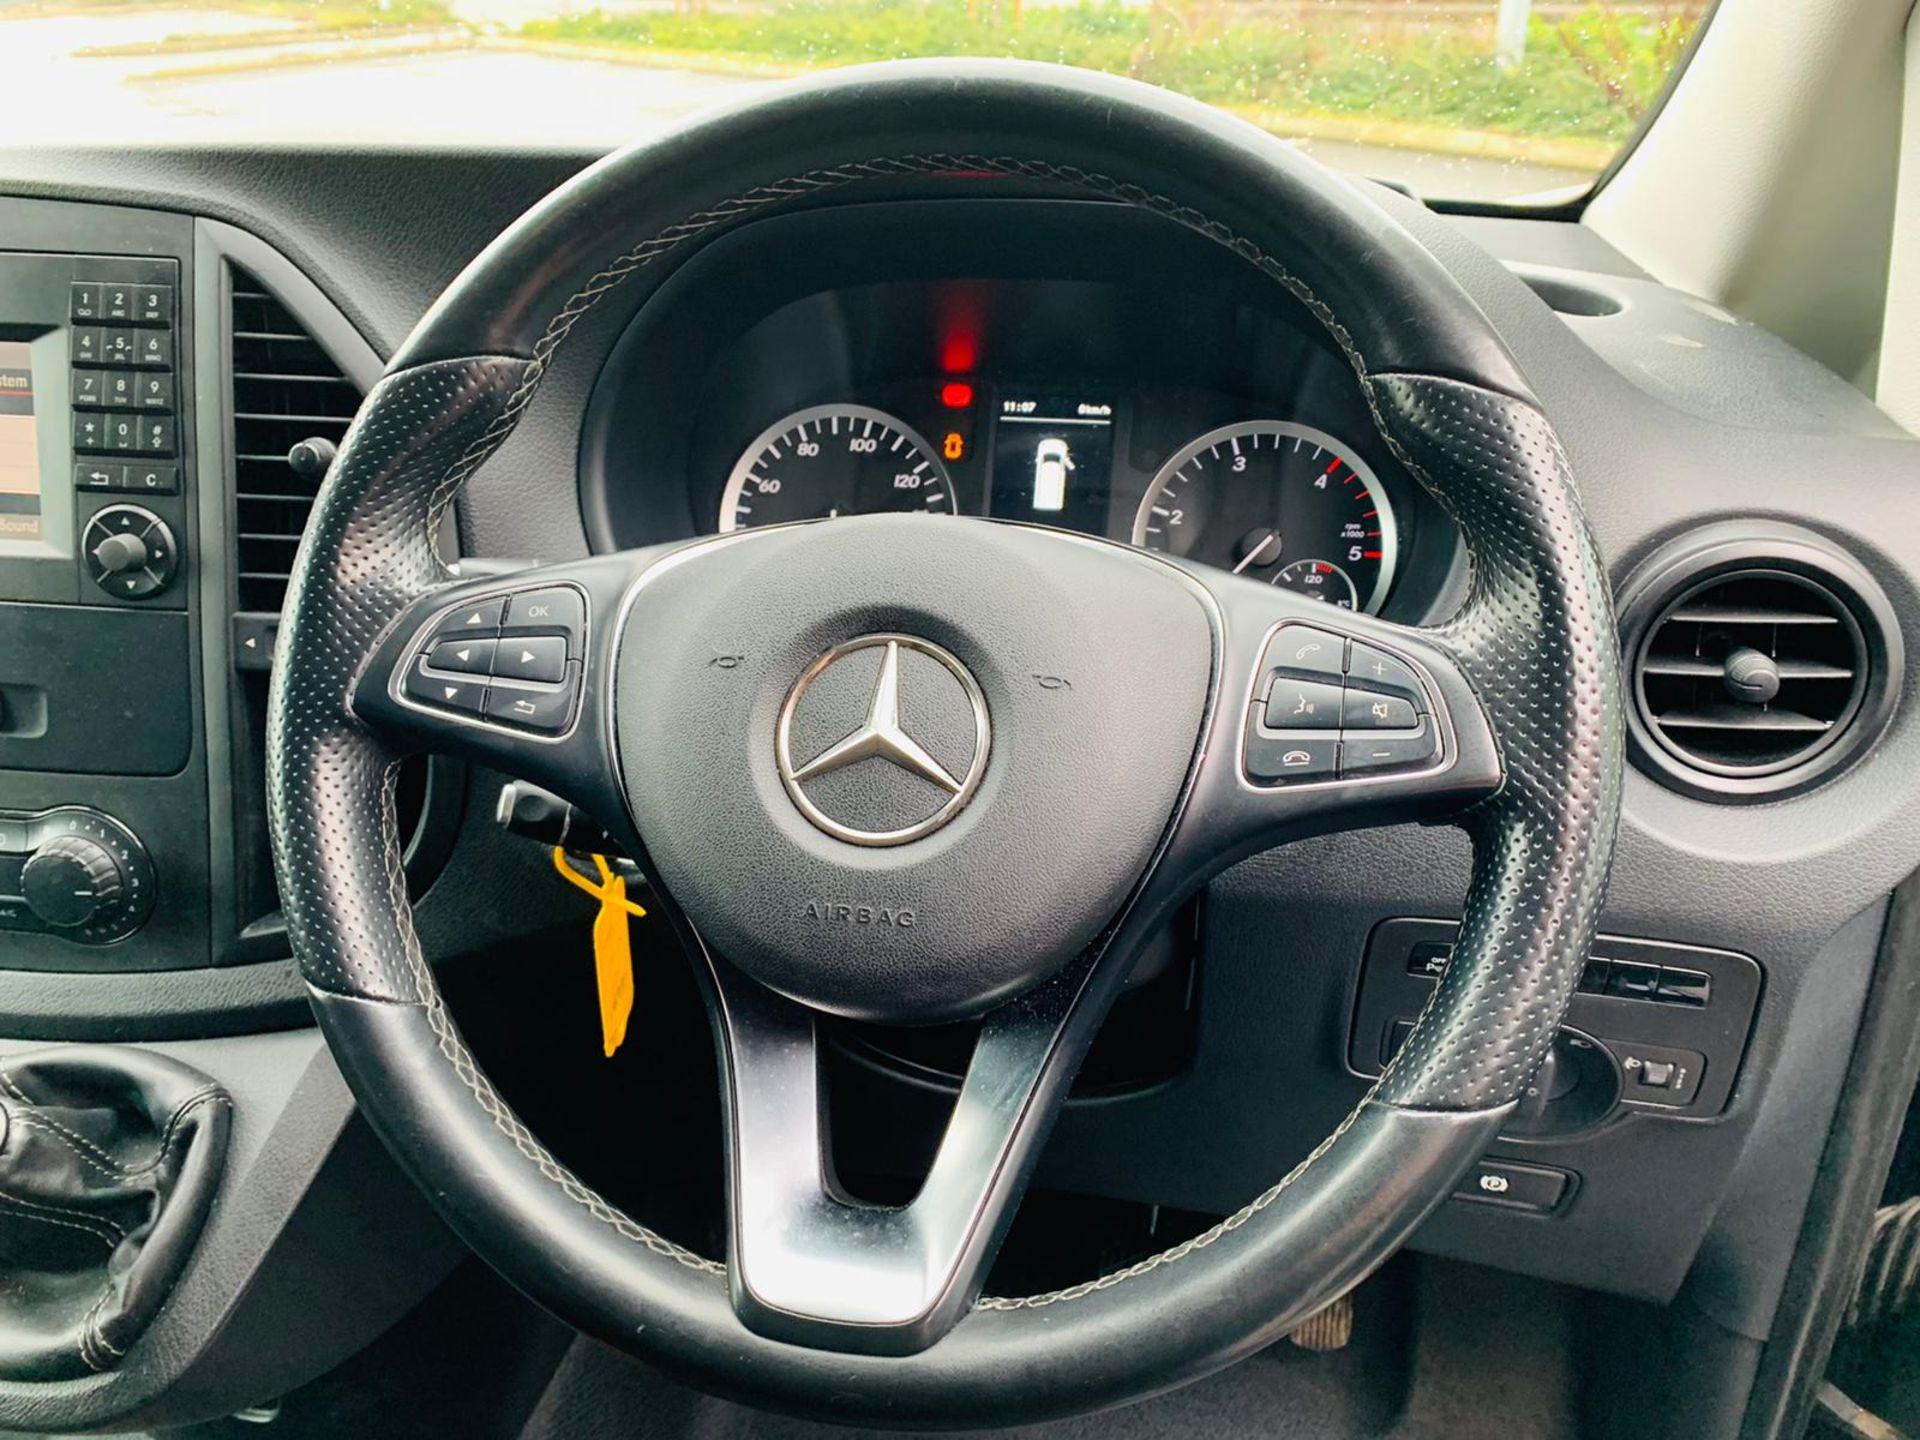 (RESERVE MET) Mercedes Vito 116Cdi Sporty Spec (161 BHP) Bluetech 6 Speed Van - 2016 Model - AC - Image 24 of 28